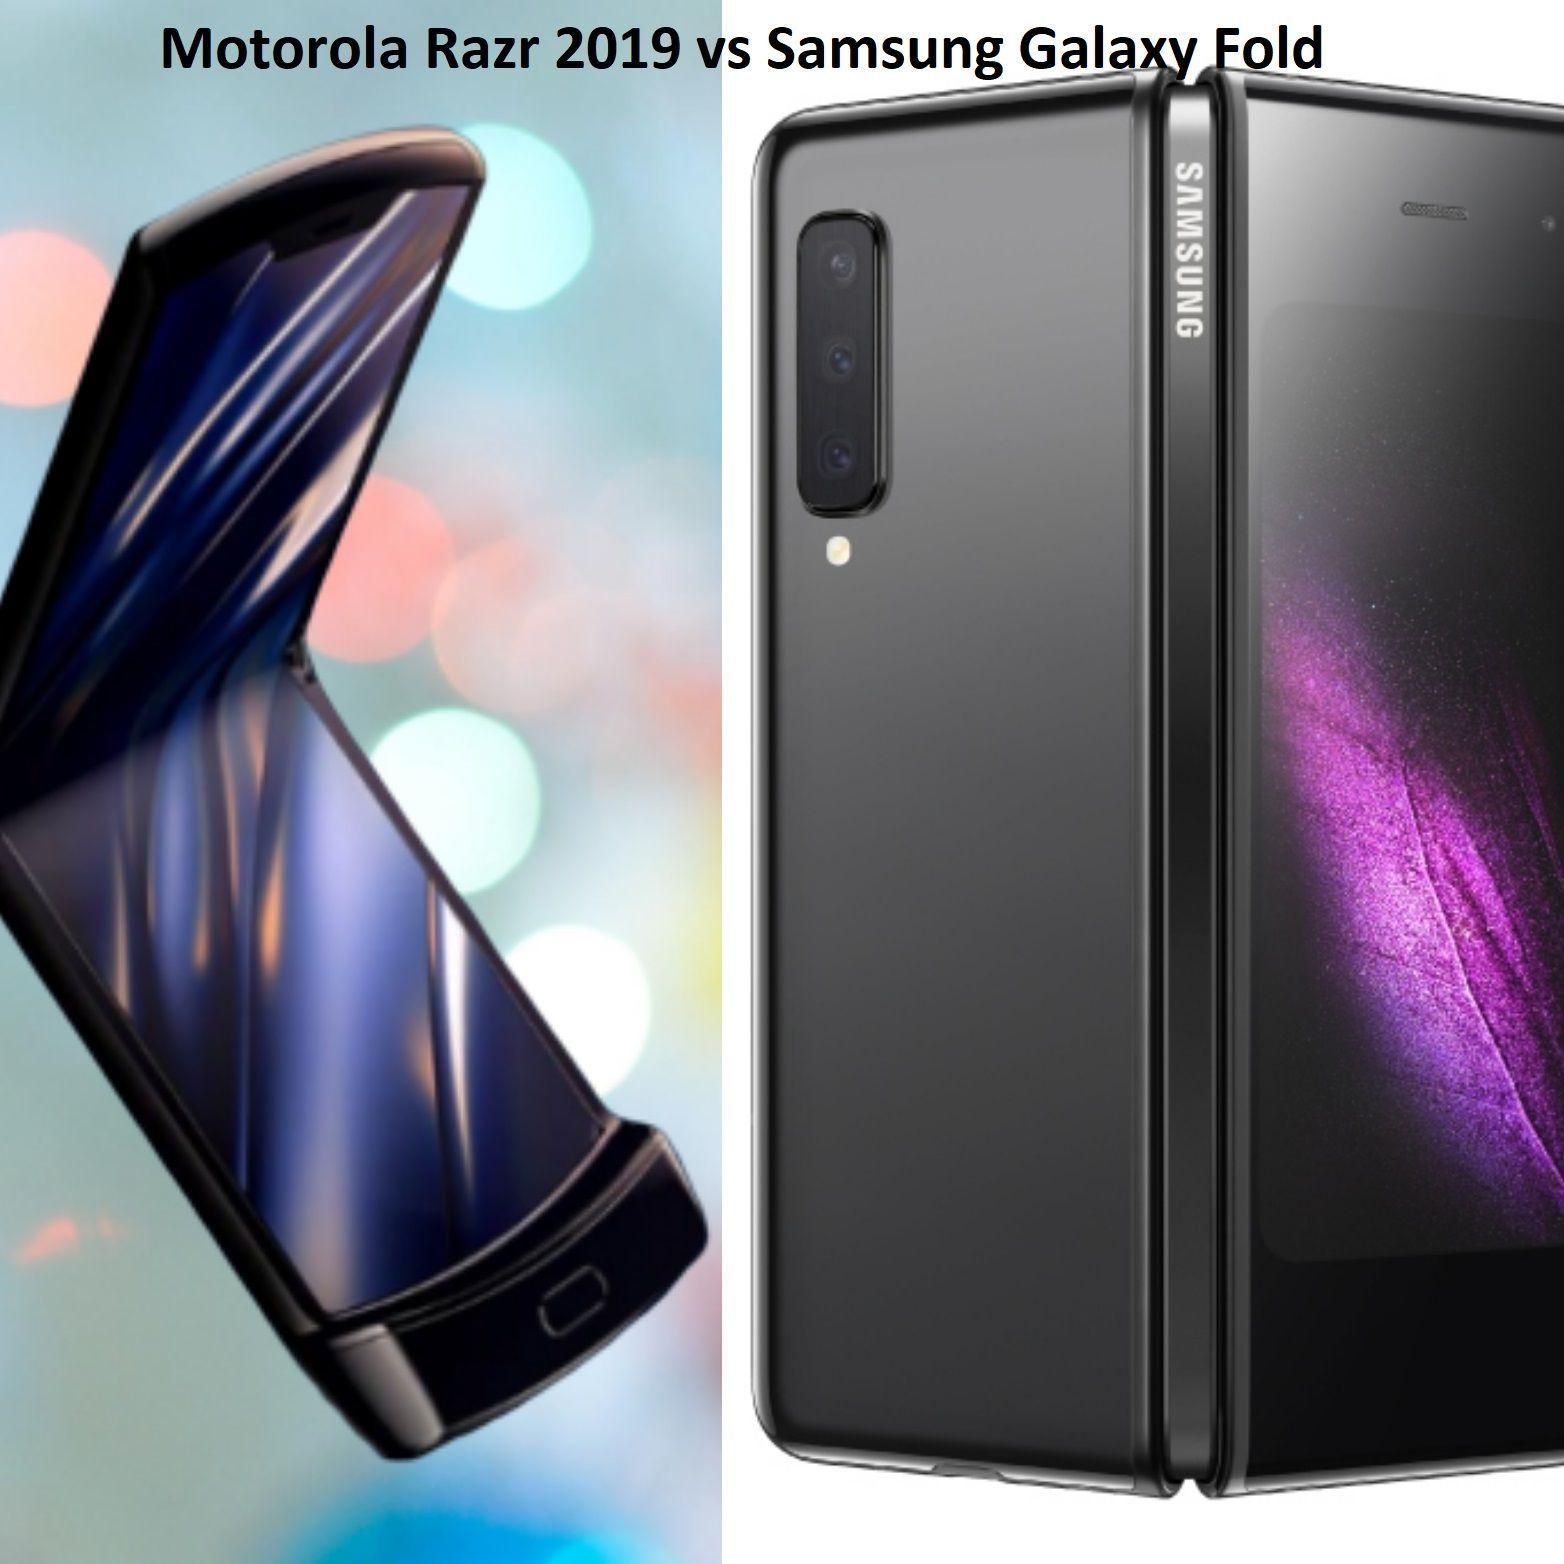 Motorola Razr 2019 Vs Samsung Galaxy Fold Samsung Galaxy Motorola Razr Samsung Galaxy Wallpaper